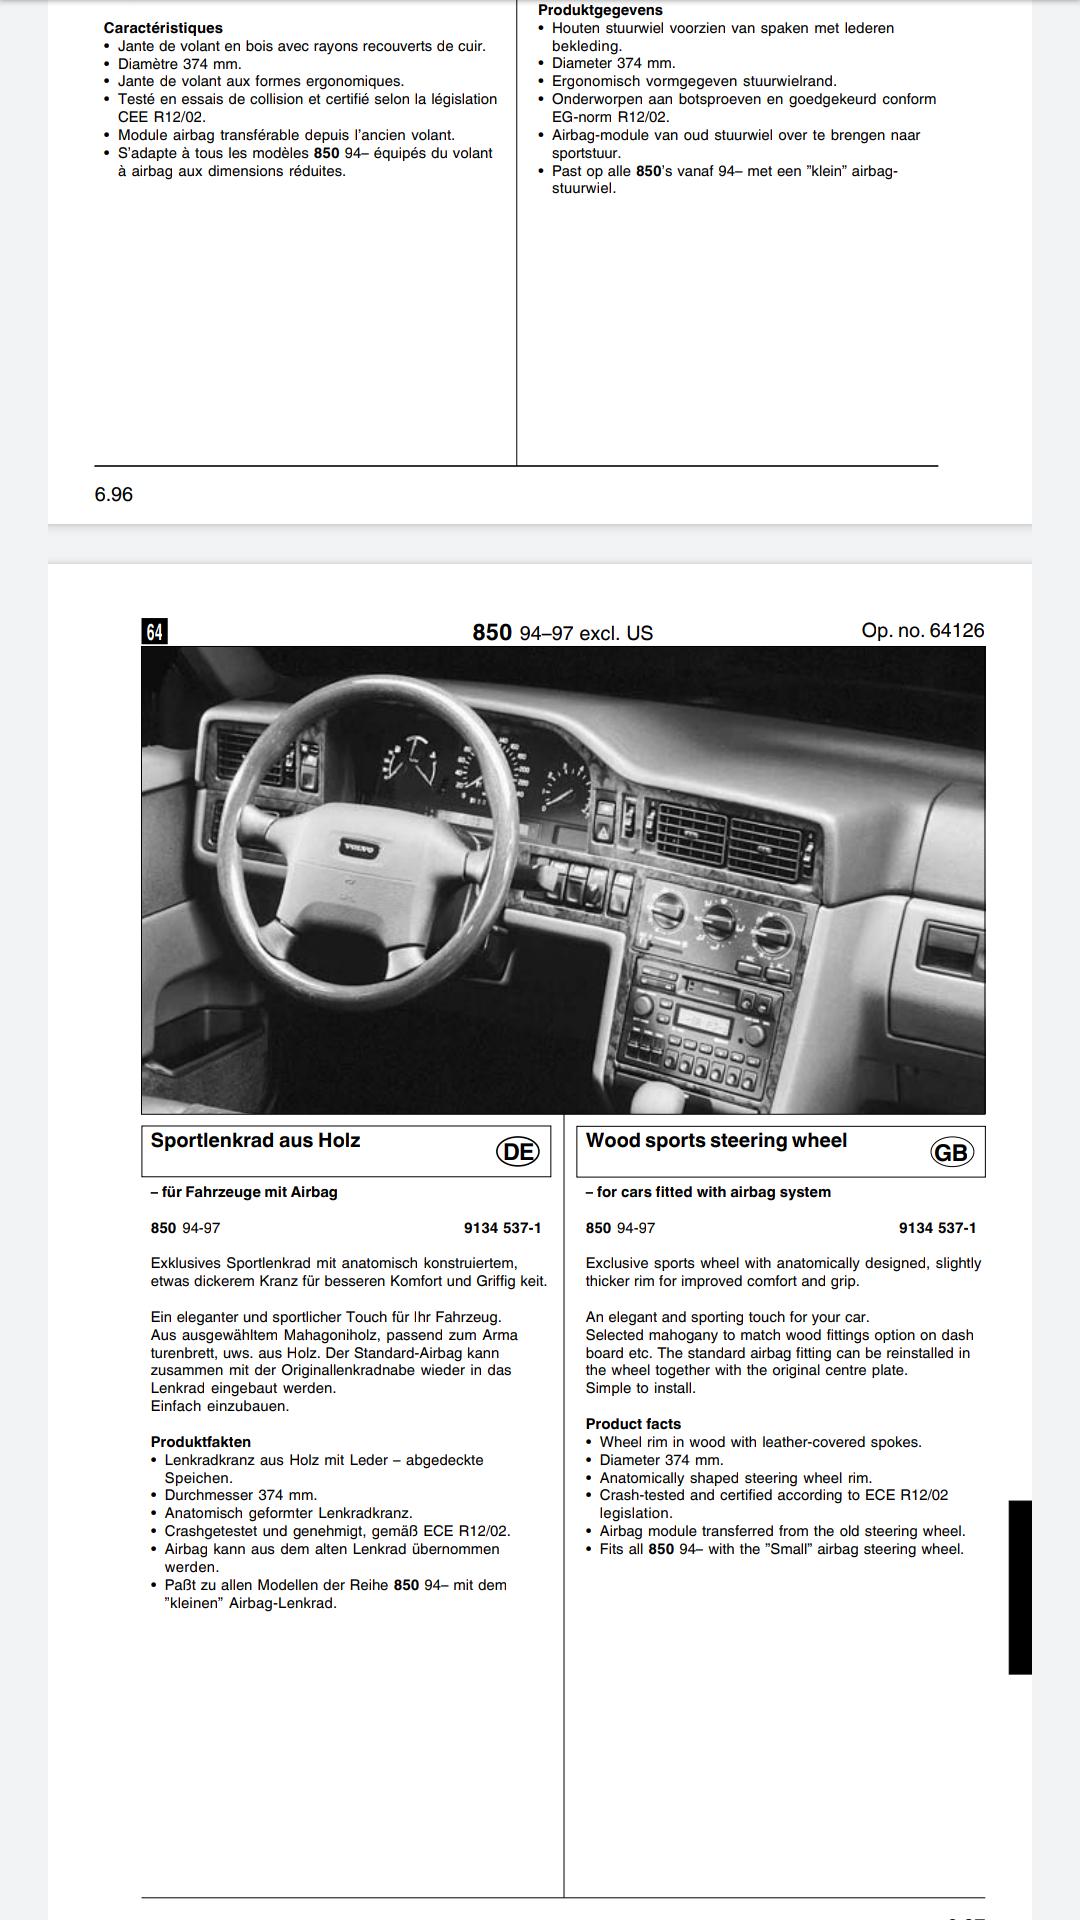 Screenshot_2020-02-11-17-30-49-96.png